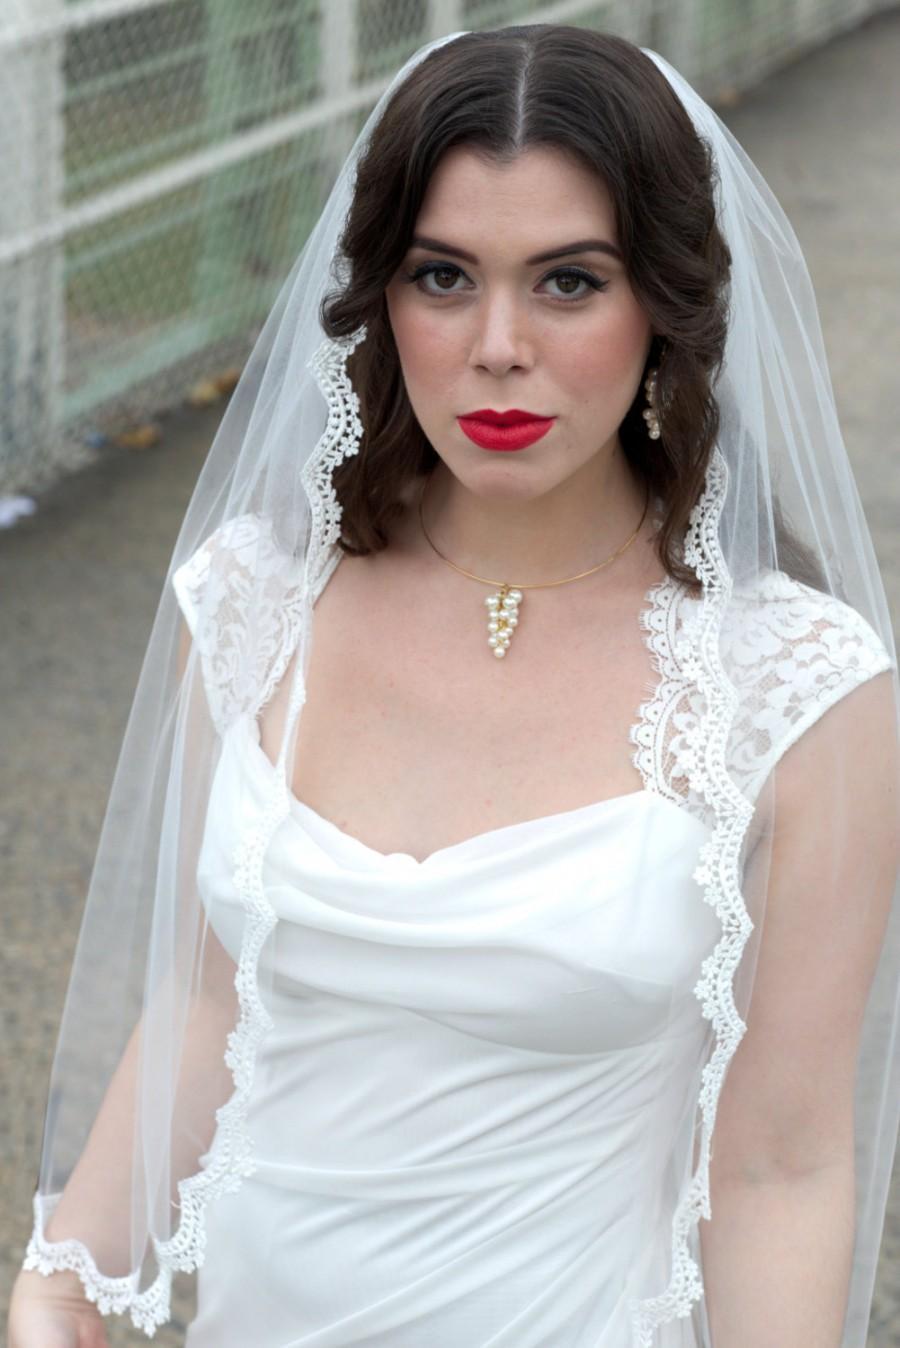 Mariage - Gentle Lace Wedding Veil